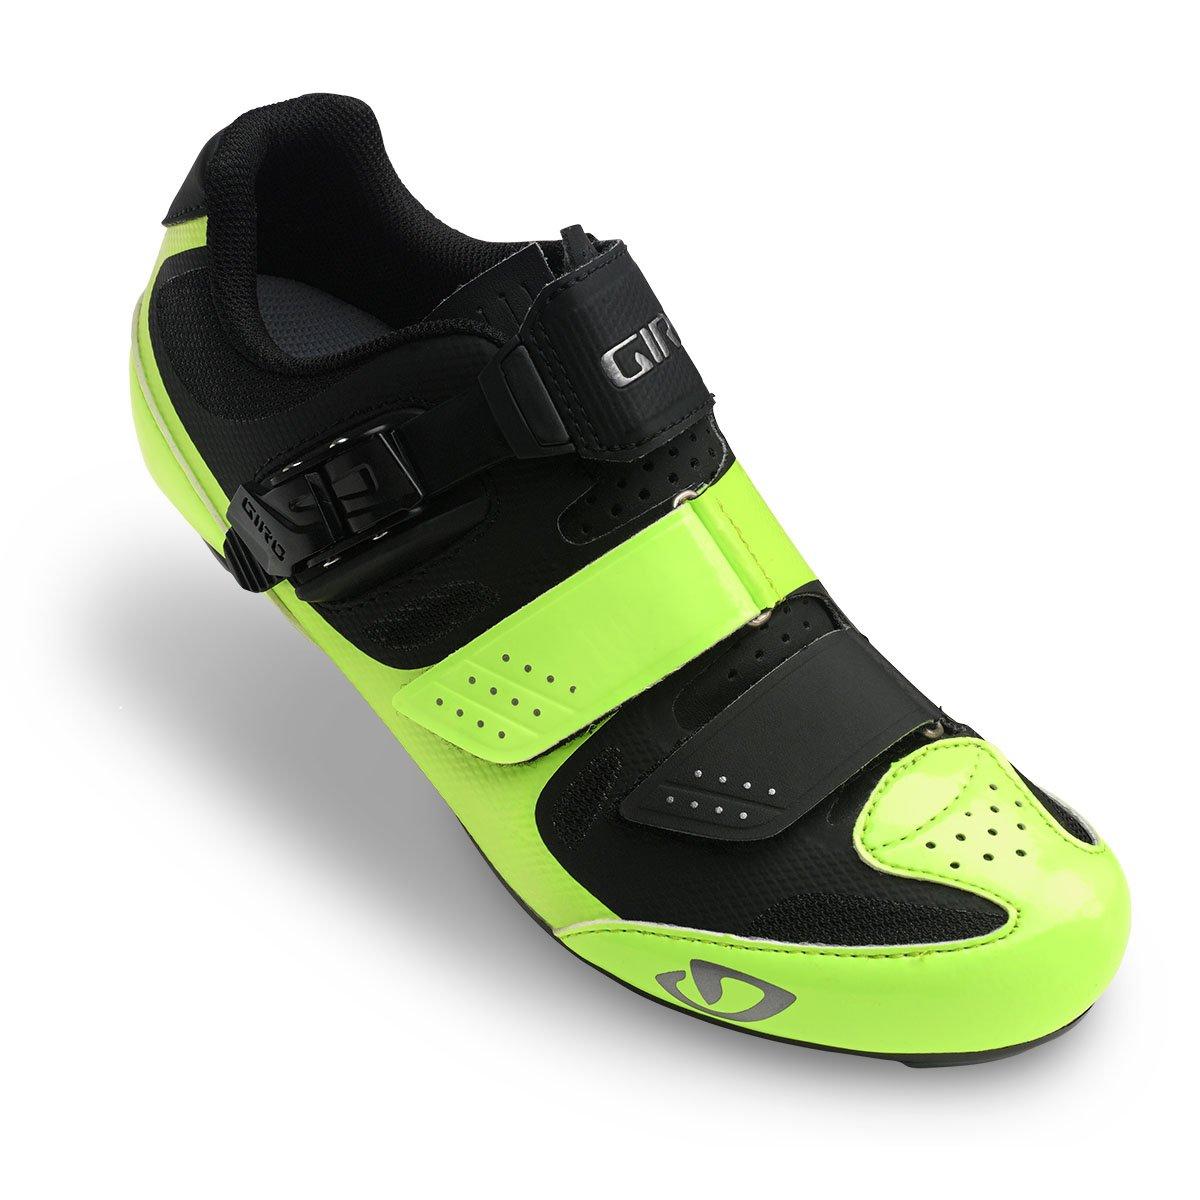 Giro Solara II Womens Road Cycling Shoes B01LYGQJDQ 38.5 M EU|Highlight Yellow/Black